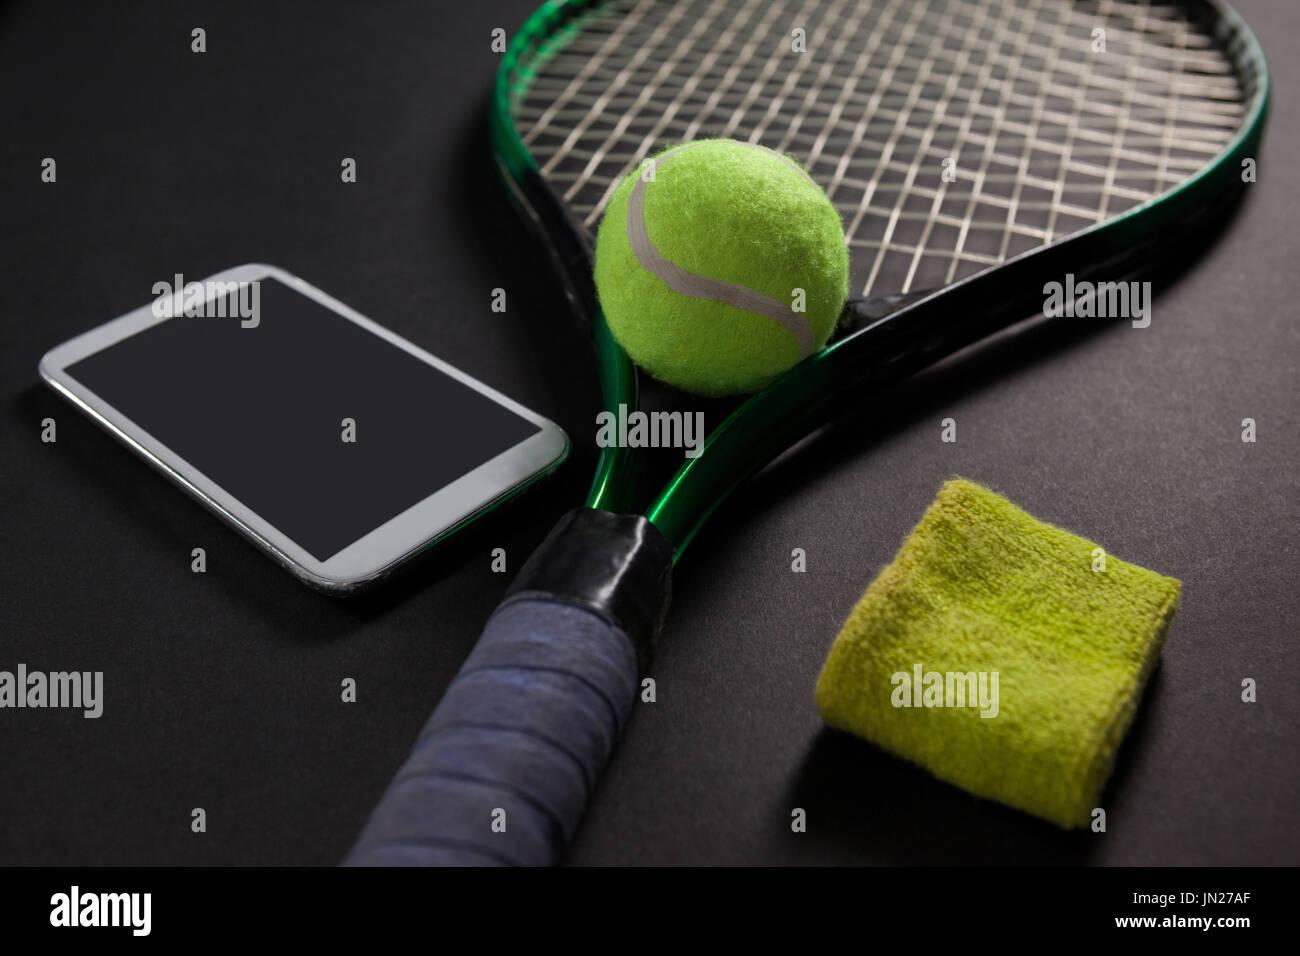 big sale 1b45c 390fc Tennisausrüstung Stockfotos & Tennisausrüstung Bilder - Alamy